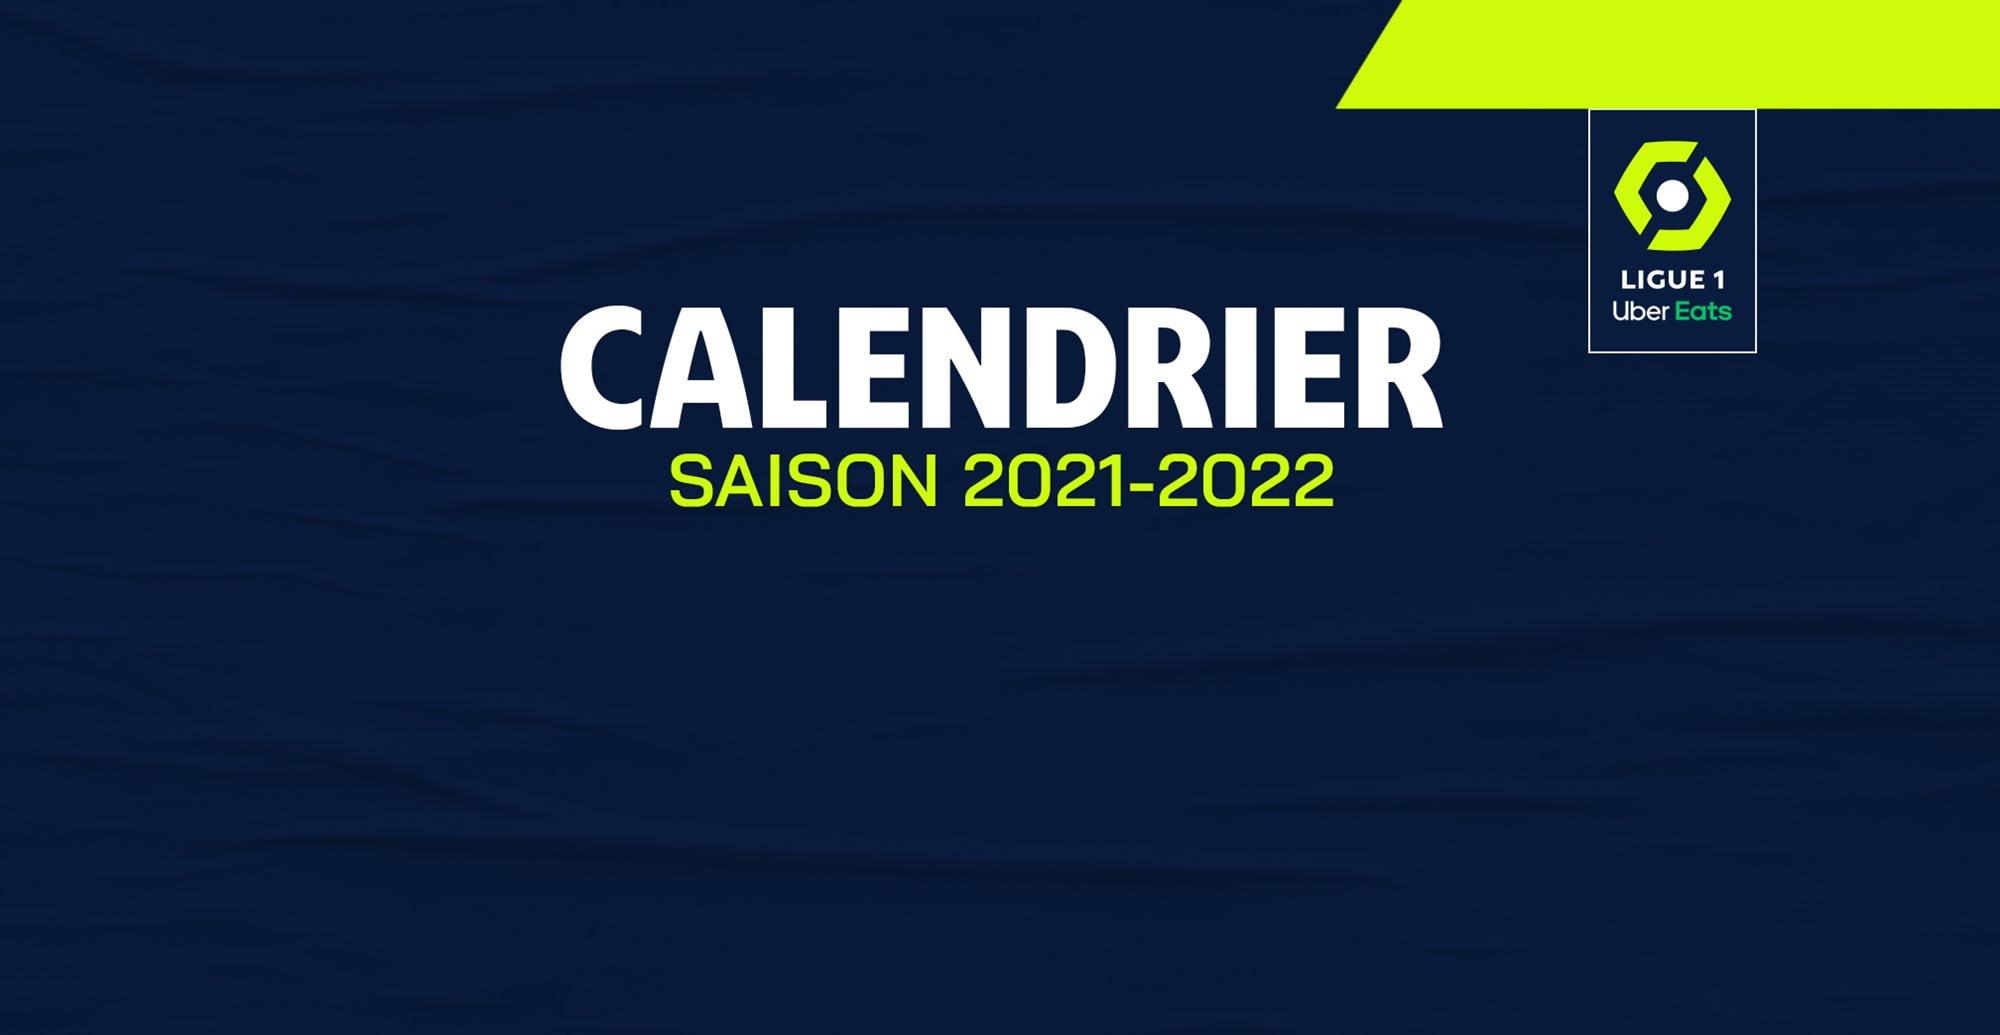 Calendrier Football 2022 Les principales dates de la saison 2021/2022